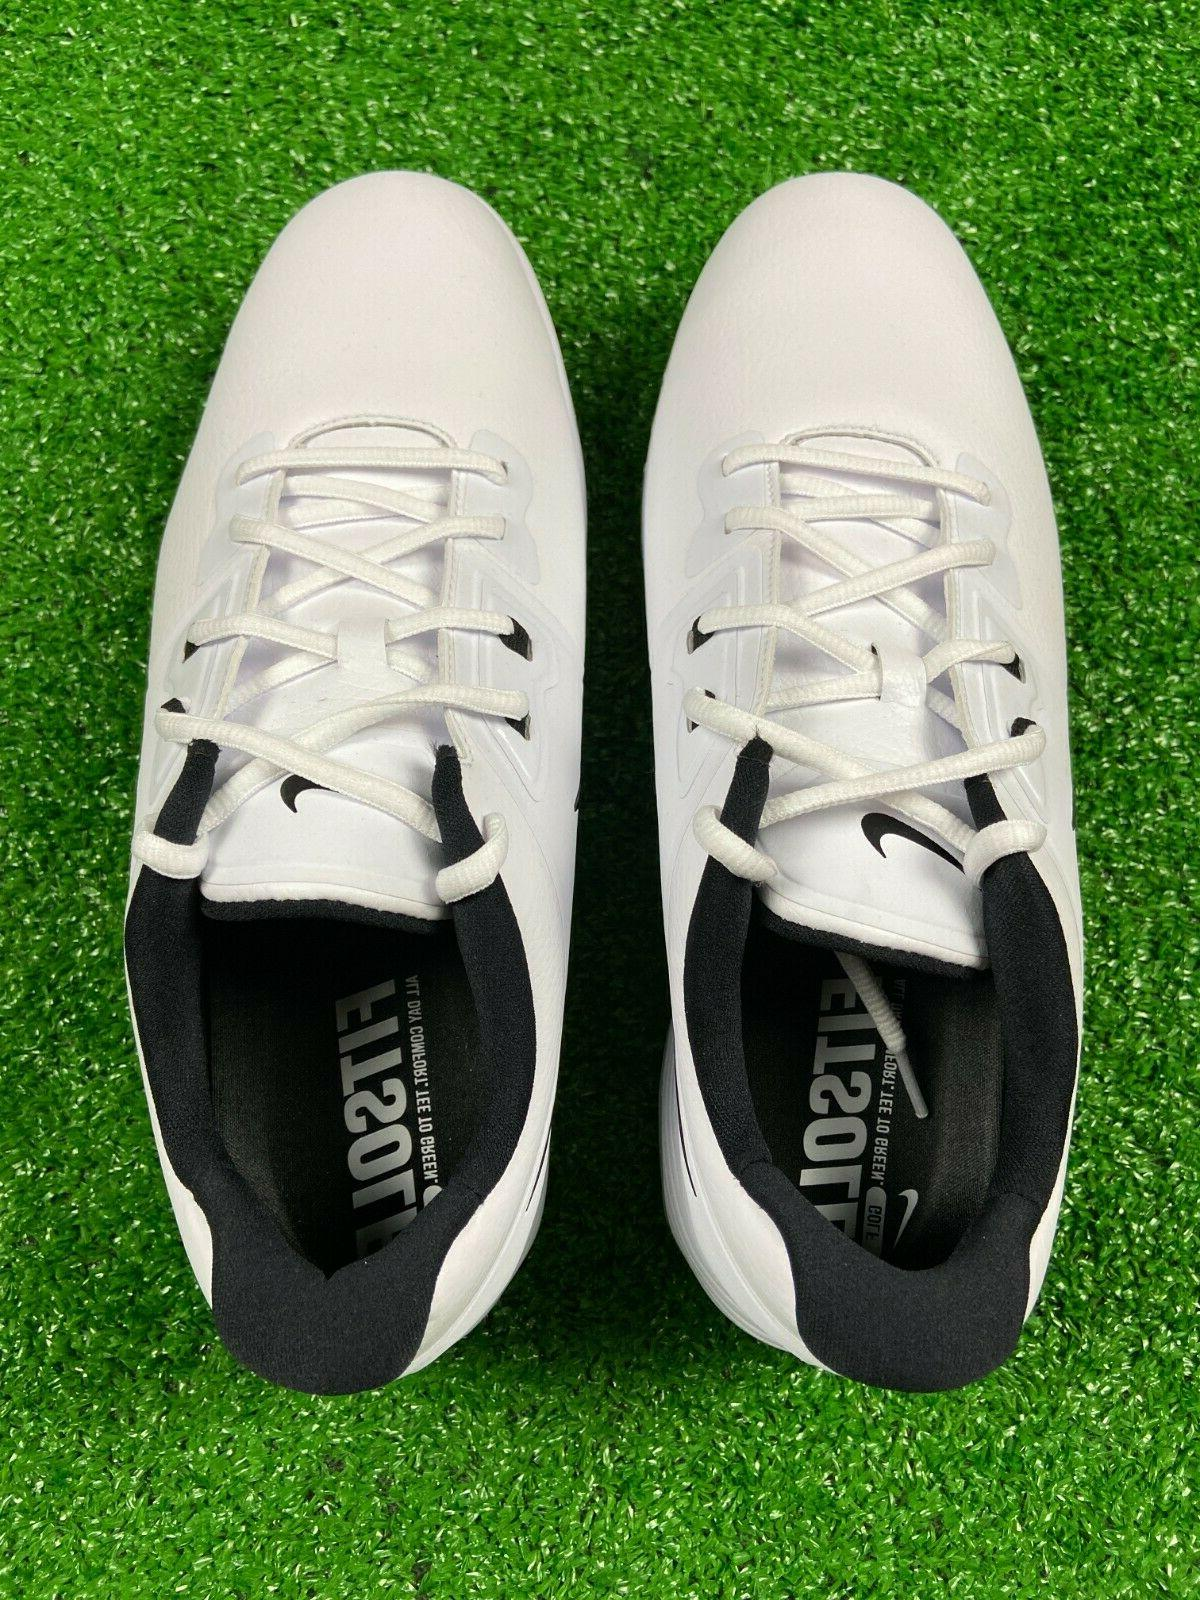 Nike Pro Golf Shoes | SZ 11